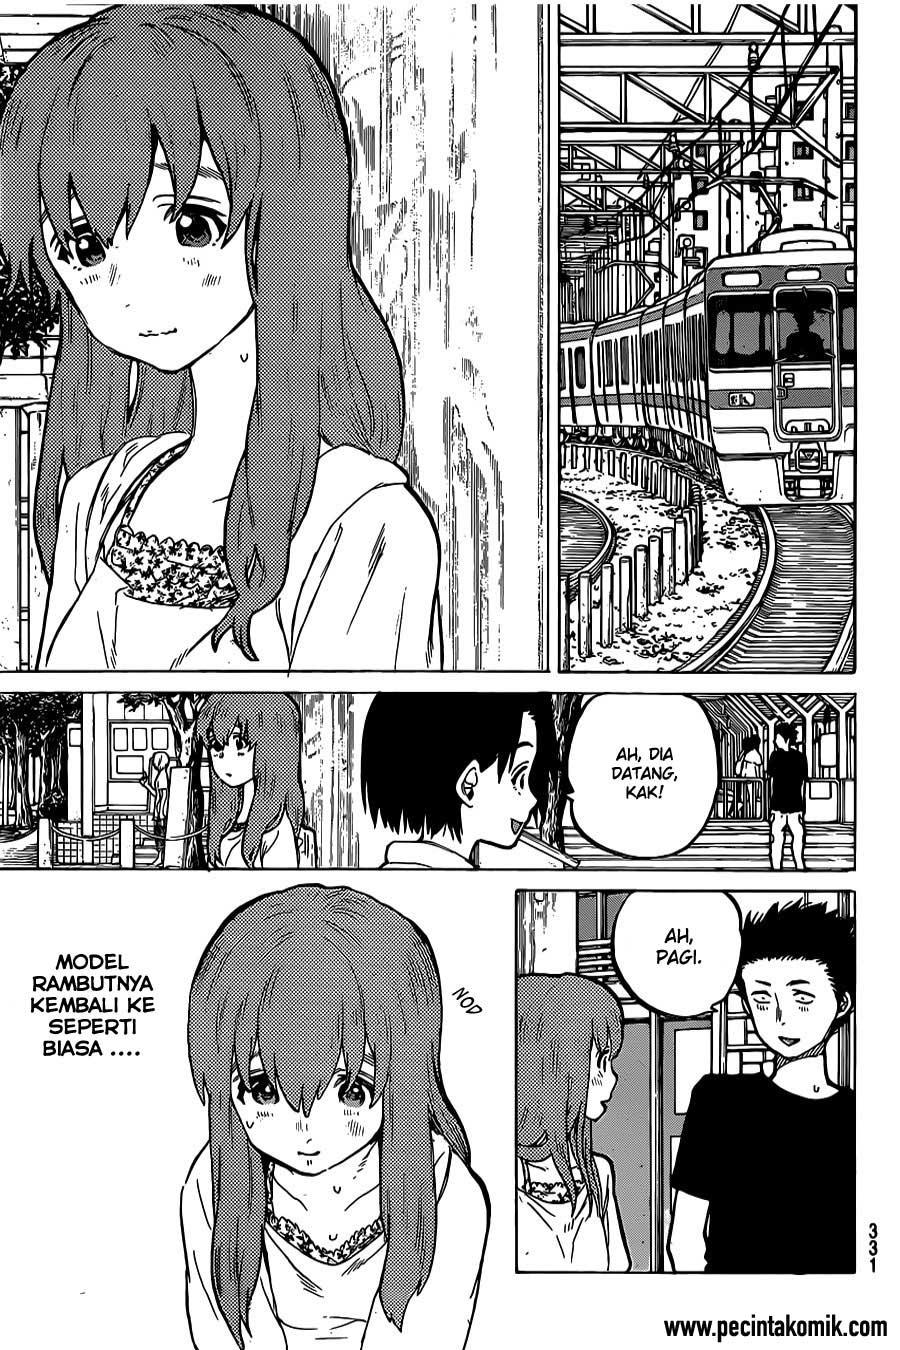 Koe no Katachi Chapter 24-20